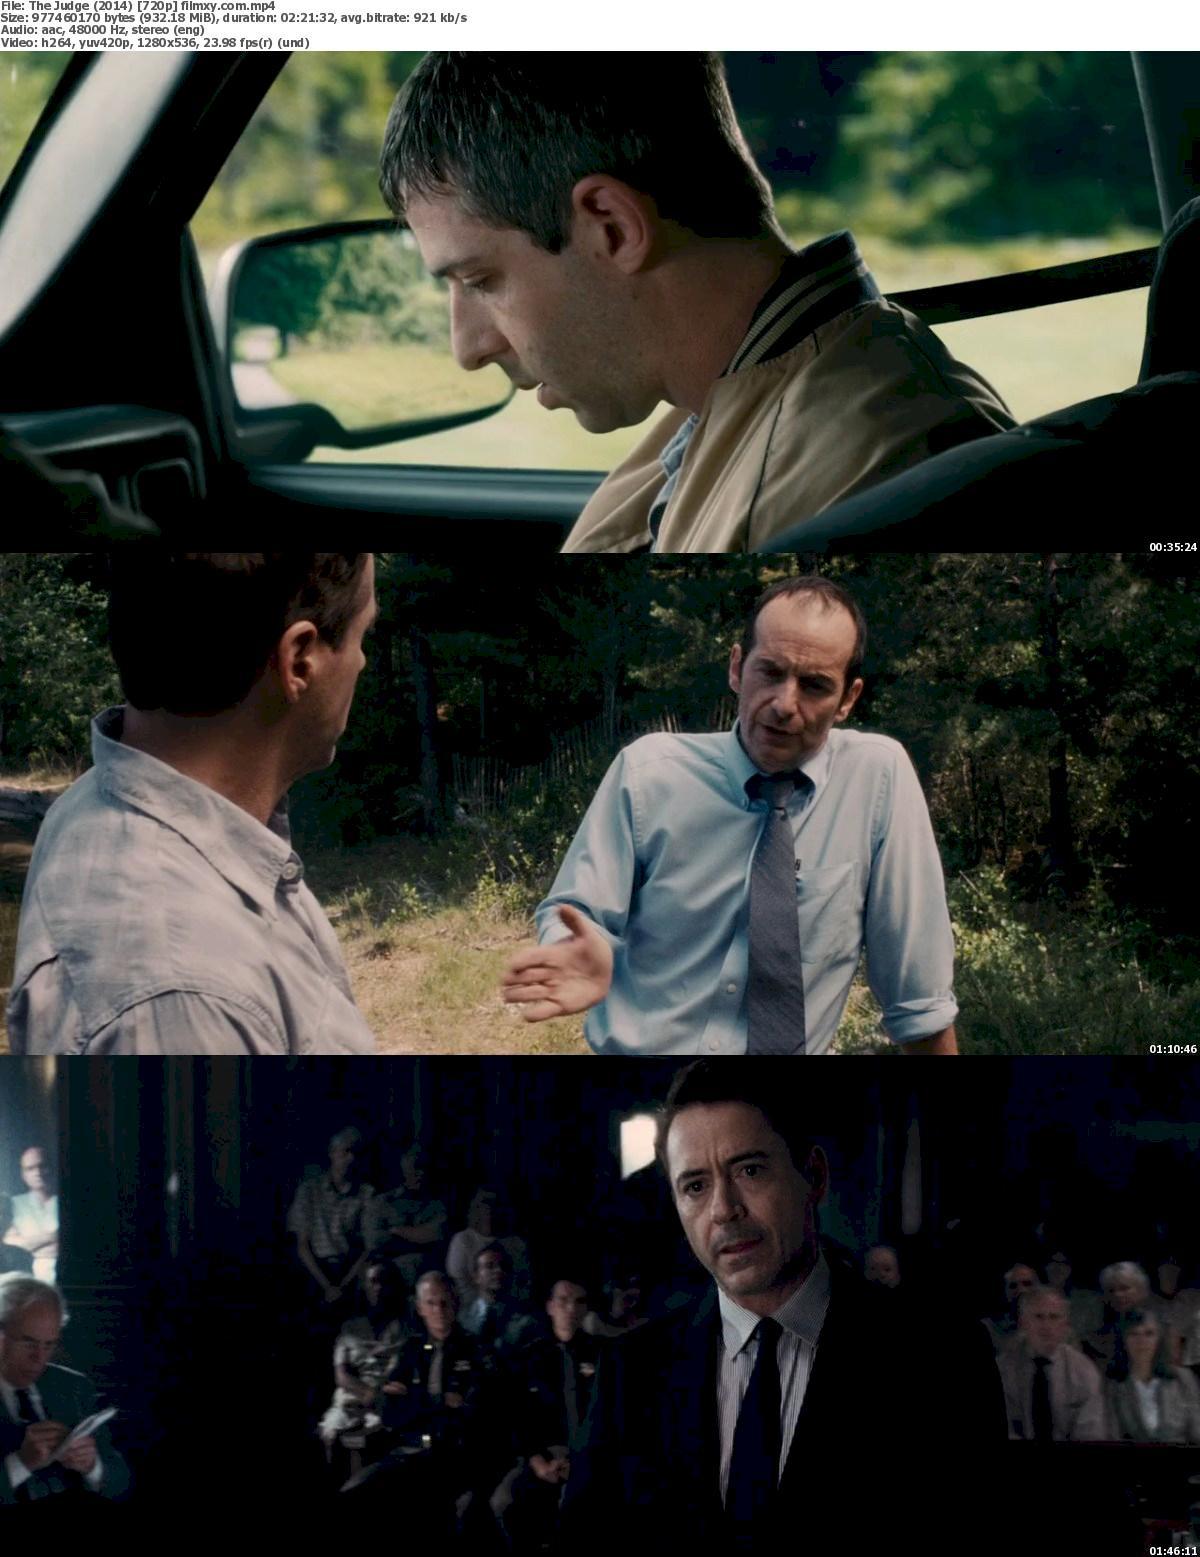 The Judge (2014) 720p 1080p Bluray Free Download Filmxy